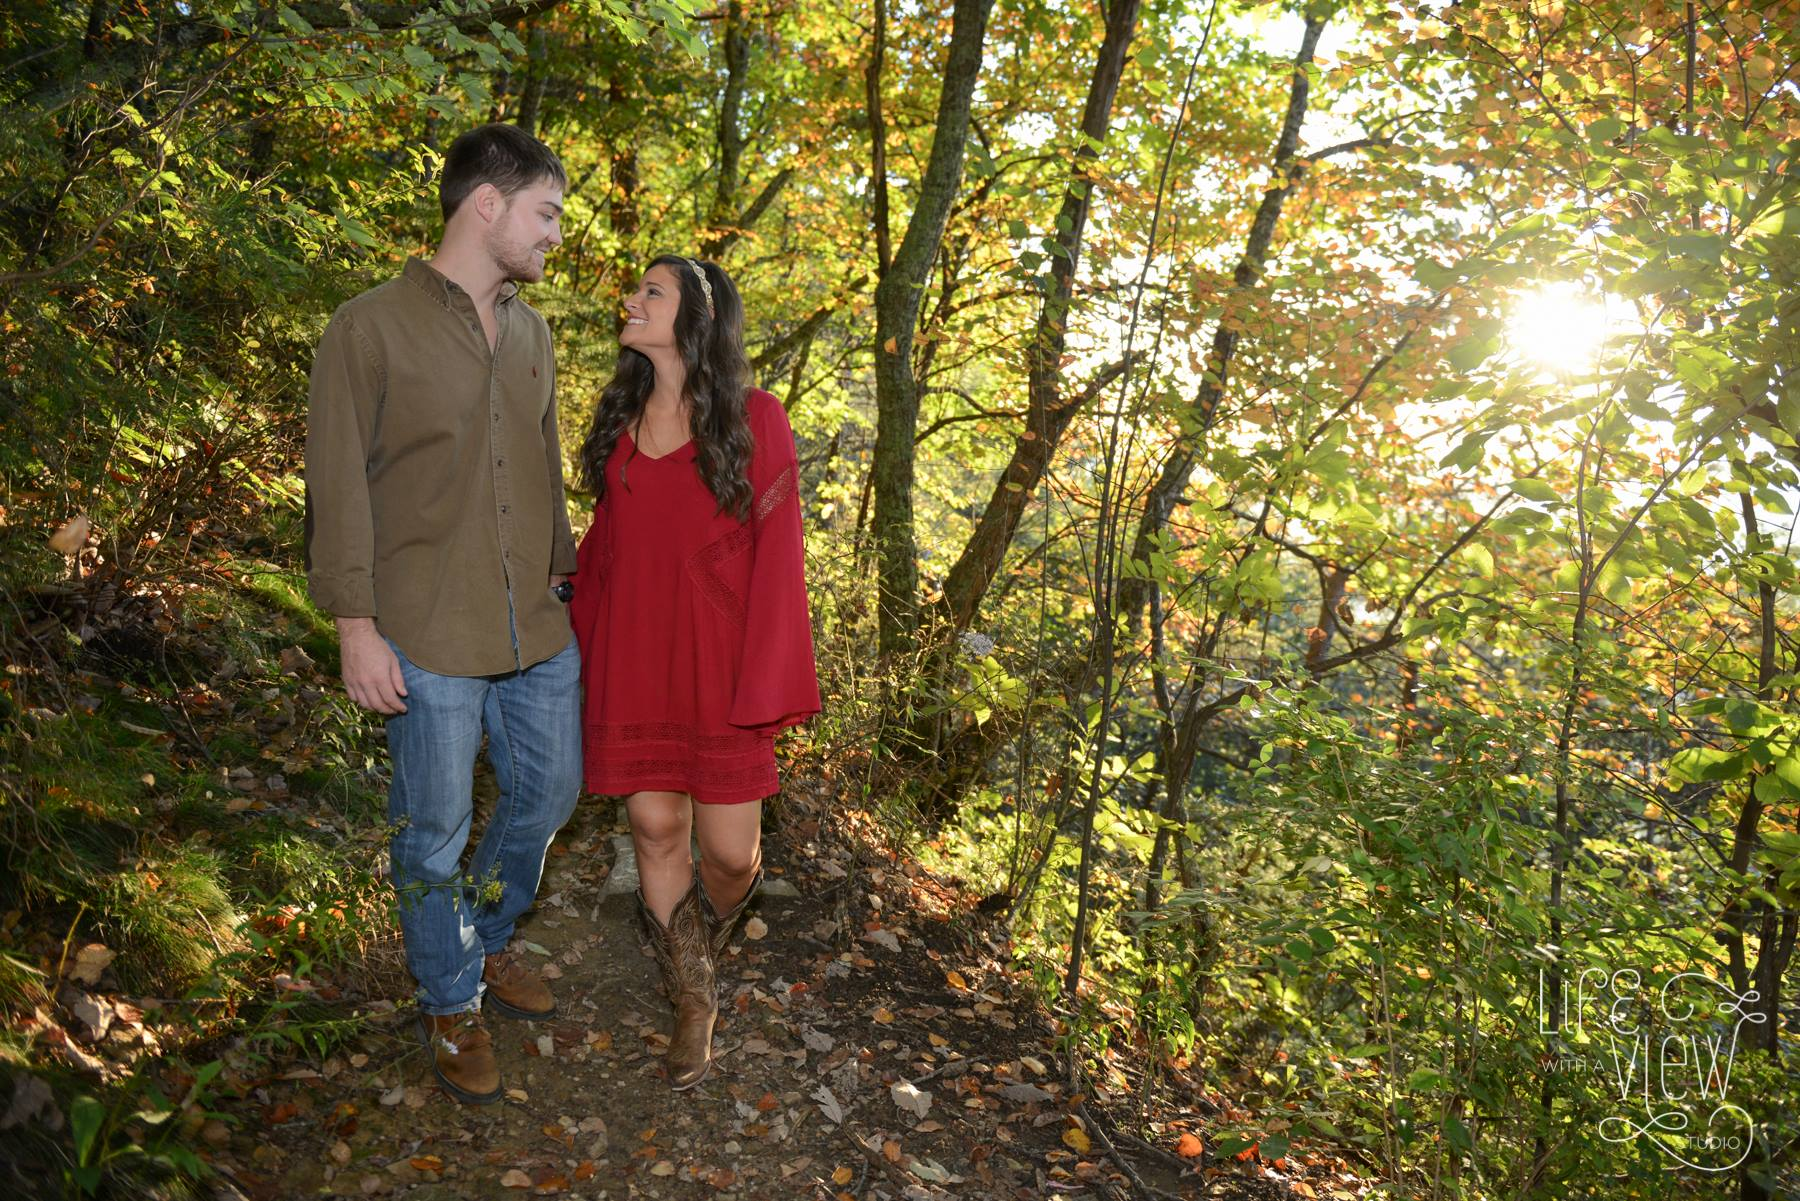 Chattanooga-Engagement 10.jpg